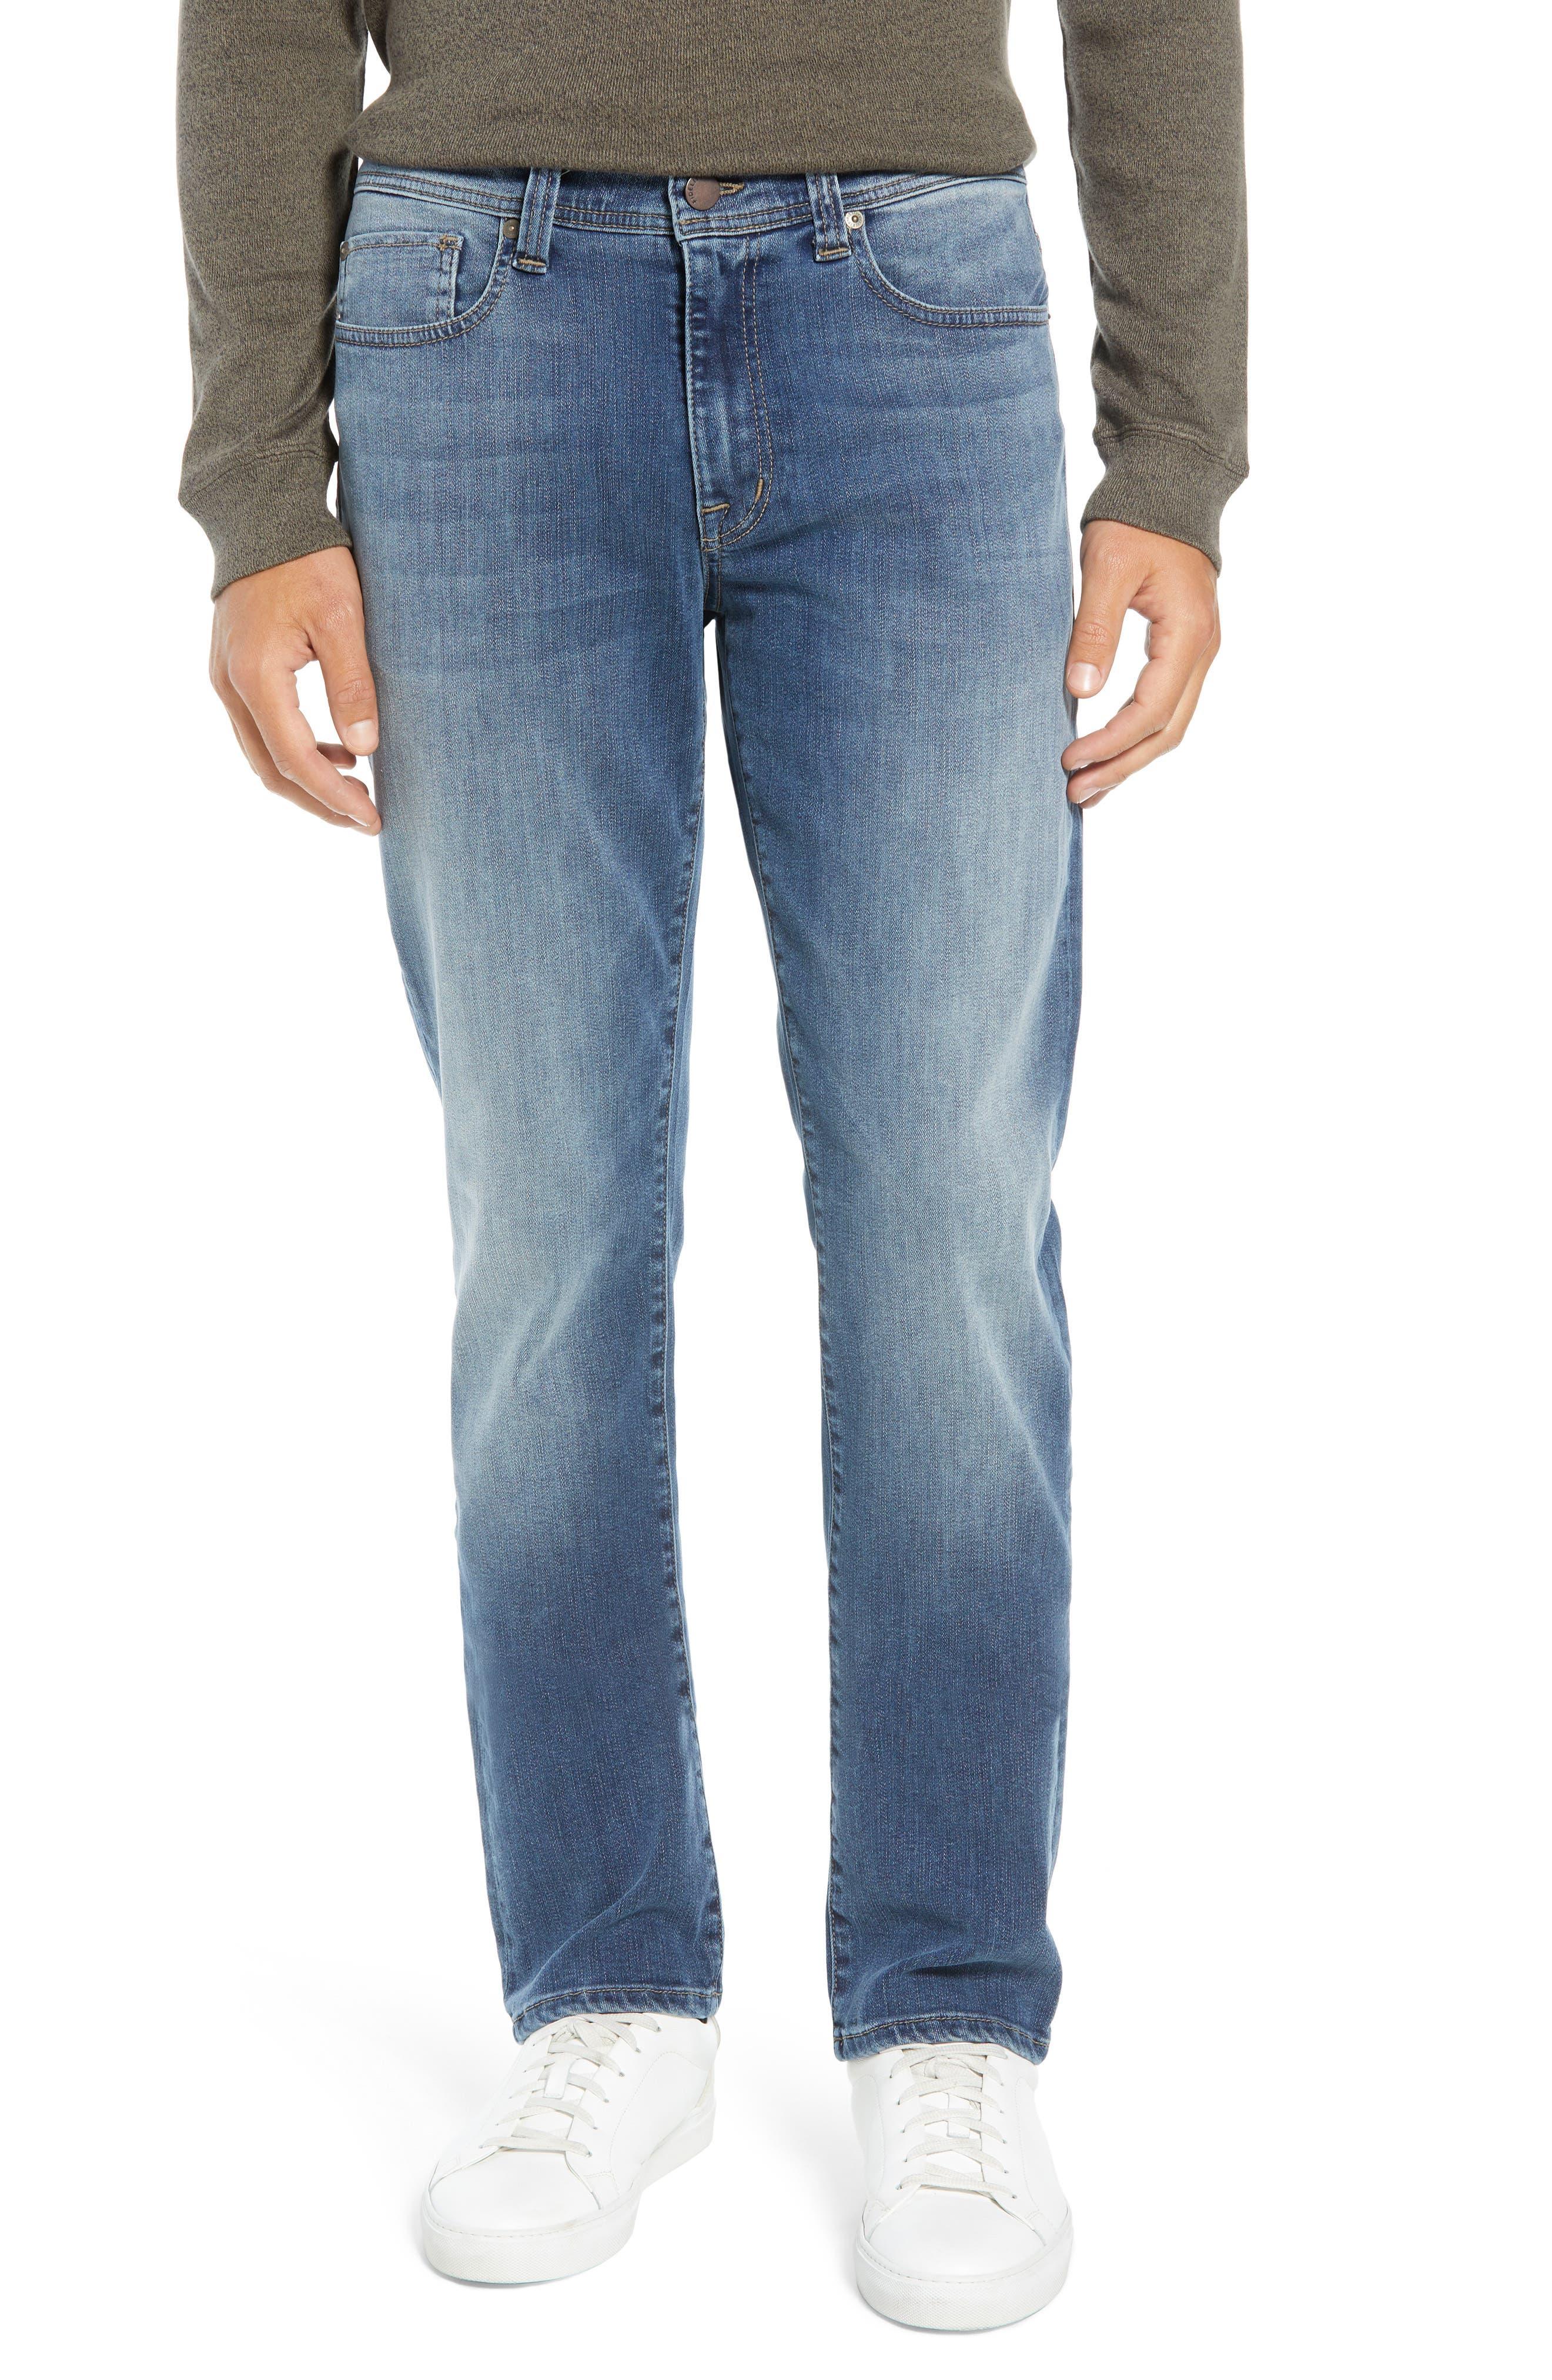 Jimmy Slim Straight Leg Jeans,                             Main thumbnail 1, color,                             FOSTER